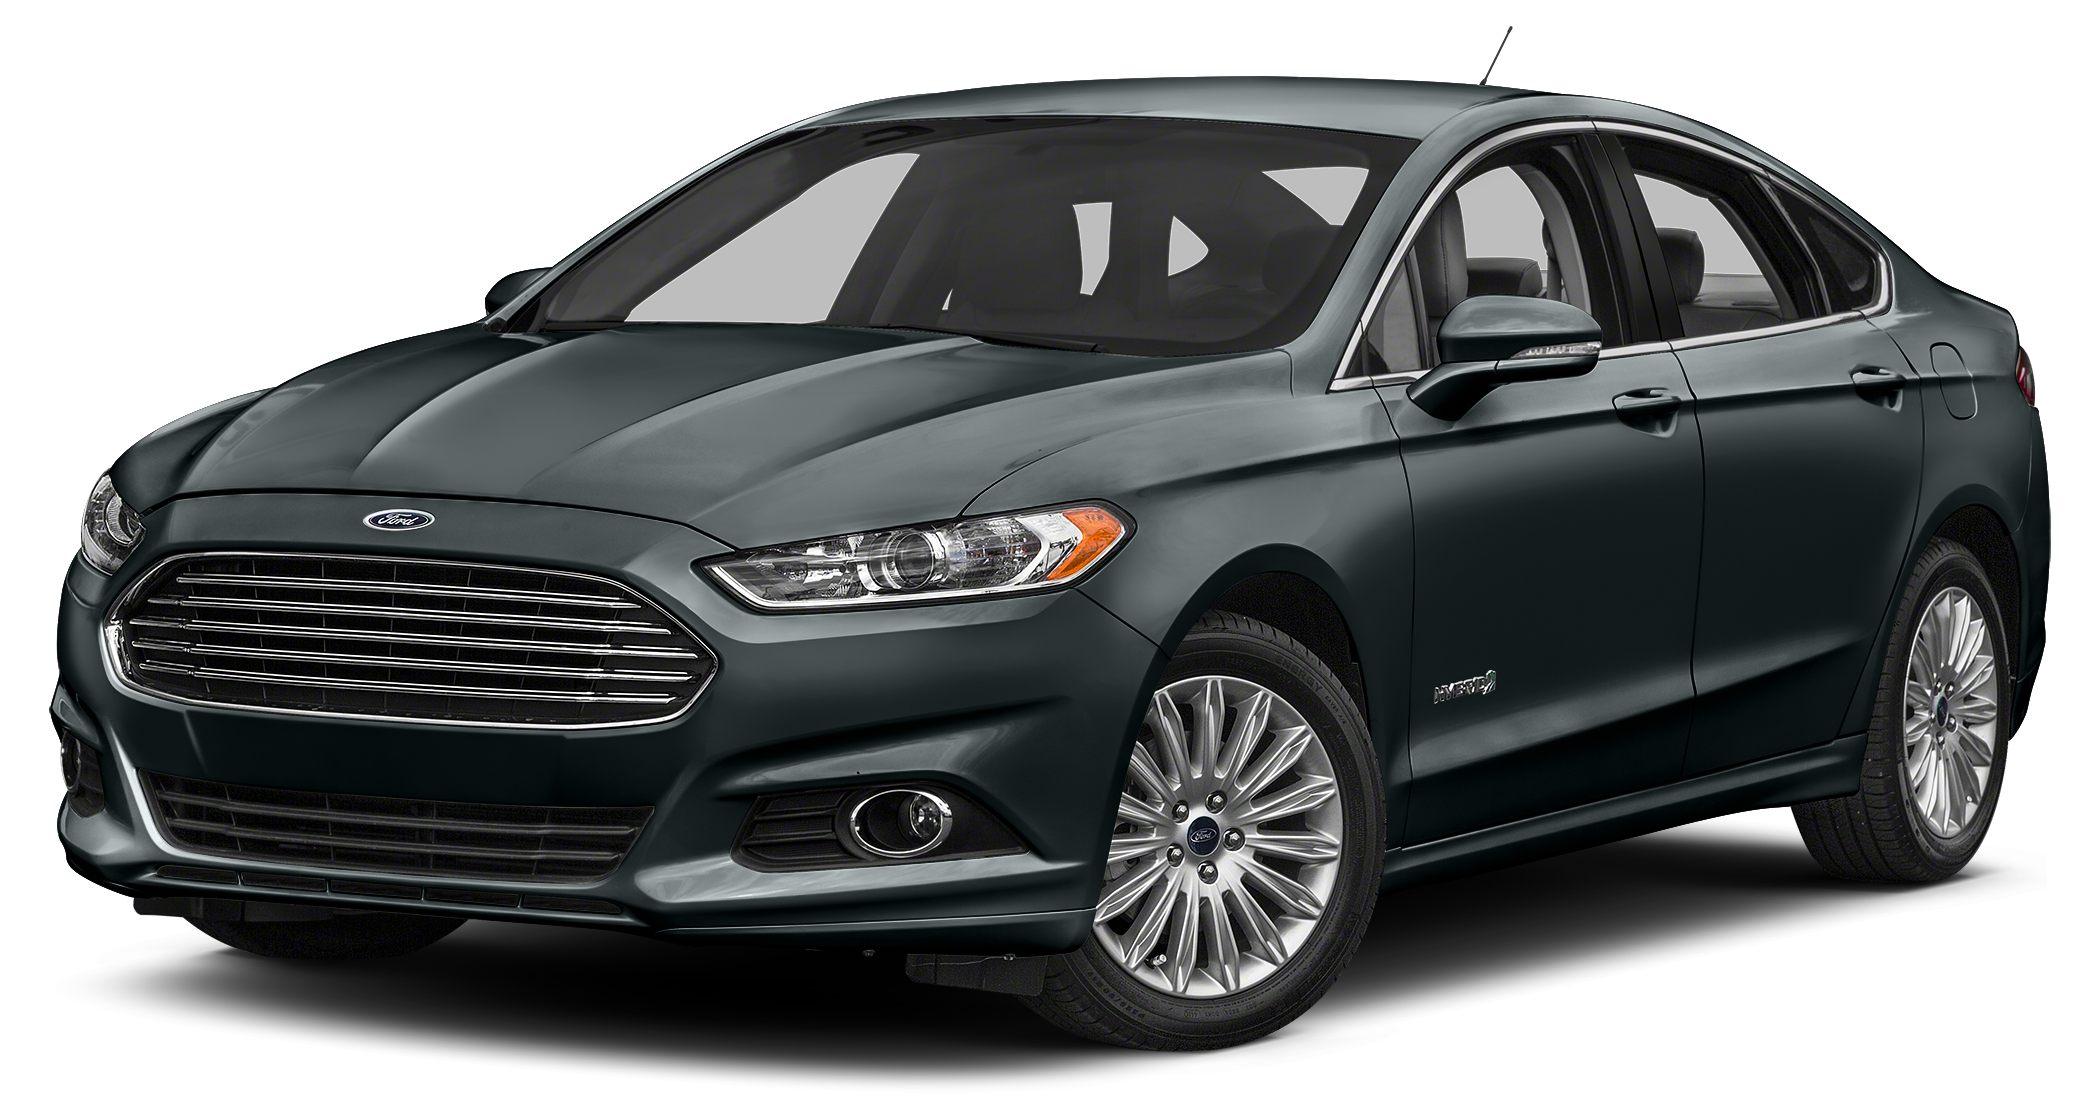 2013 Ford Fusion Hybrid SE Miles 48862Color Gray Stock 8684 VIN 3FA6P0LU6DR238354